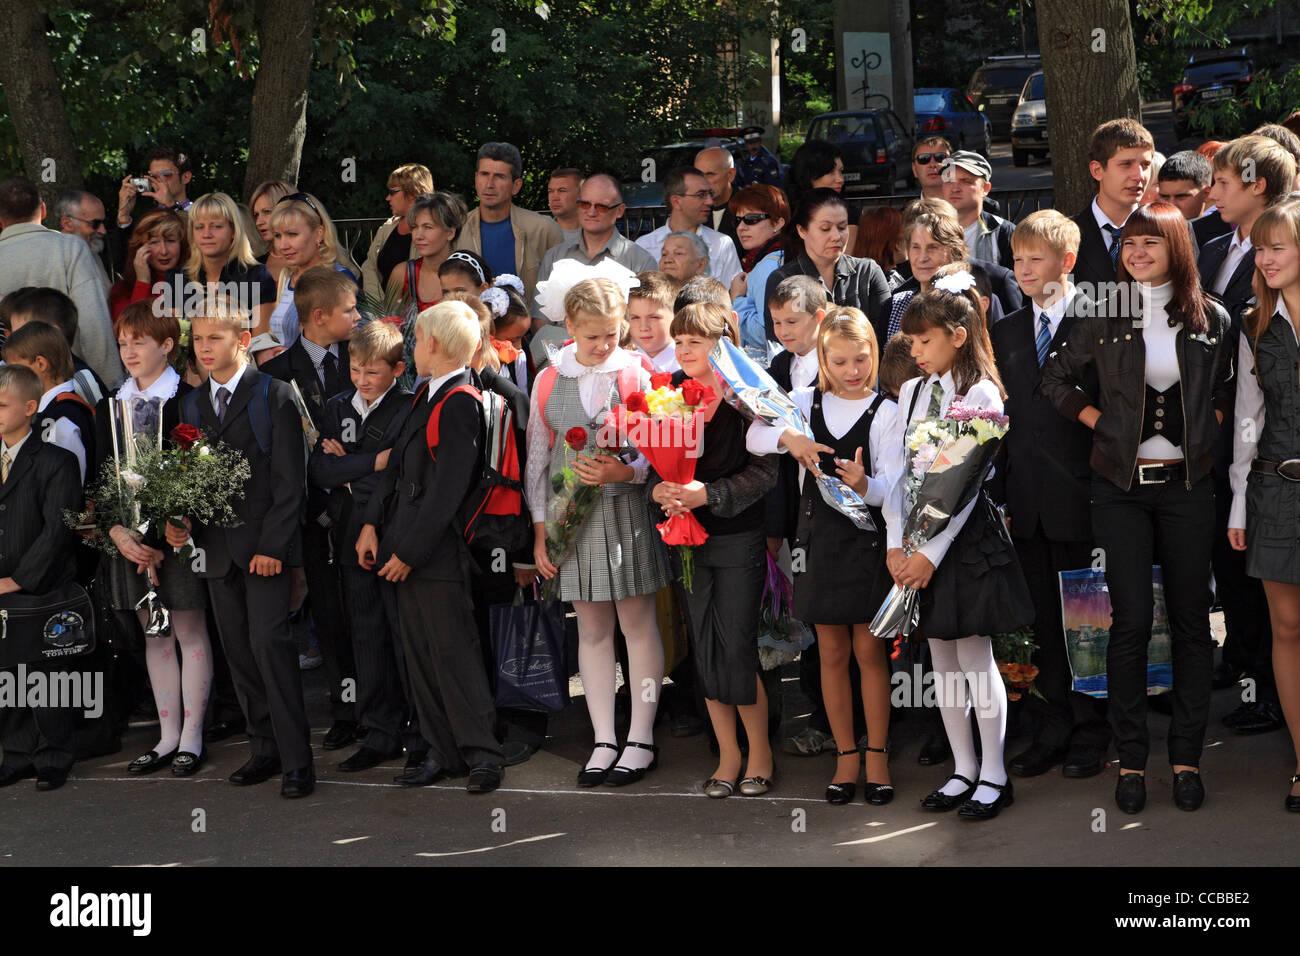 schoolchildren - Stock Image